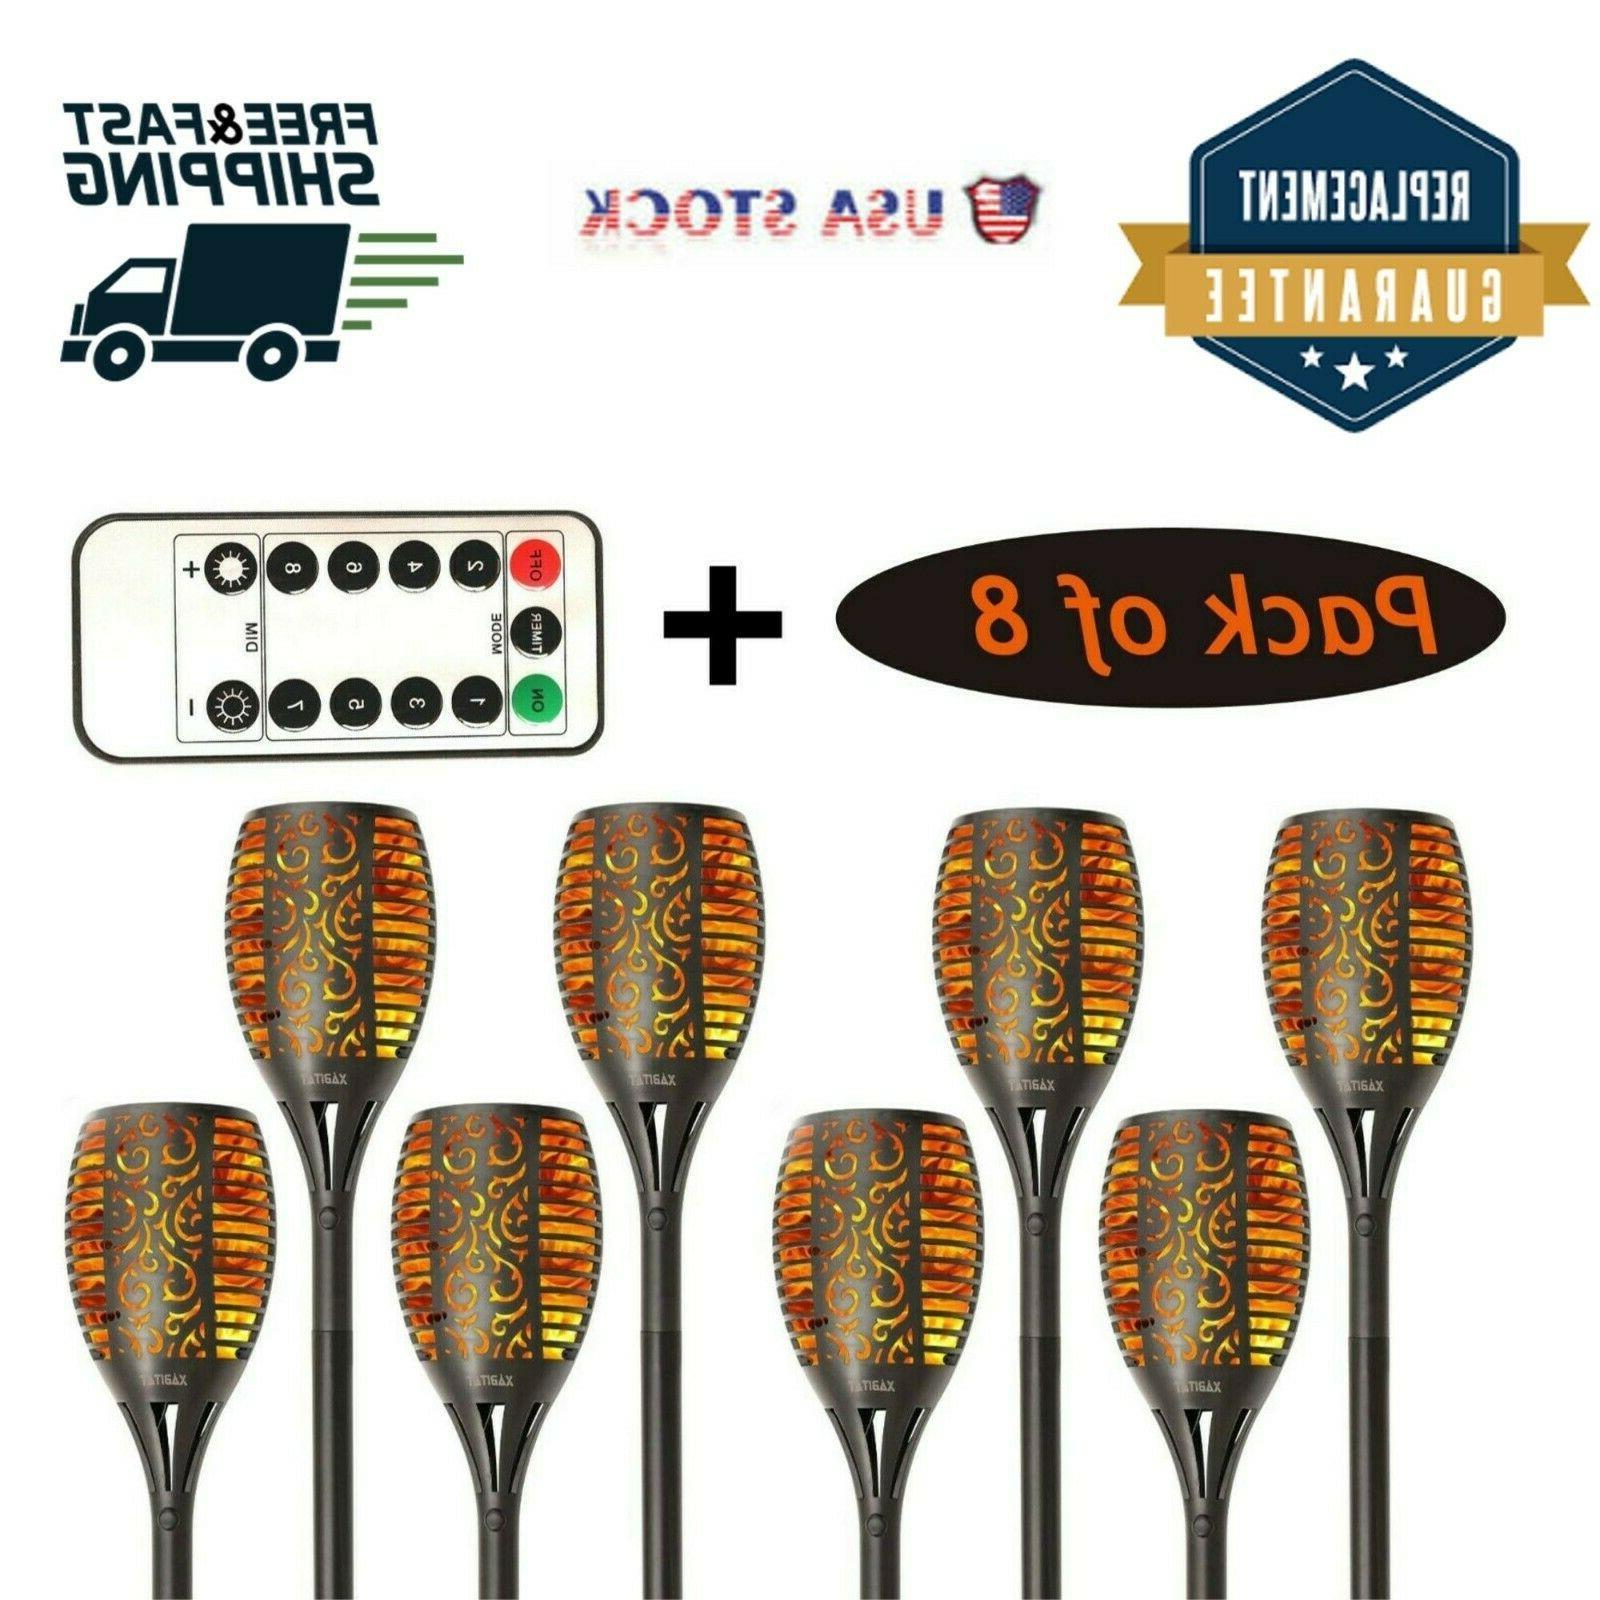 Xabitat Tiki Torches Lights-Remote